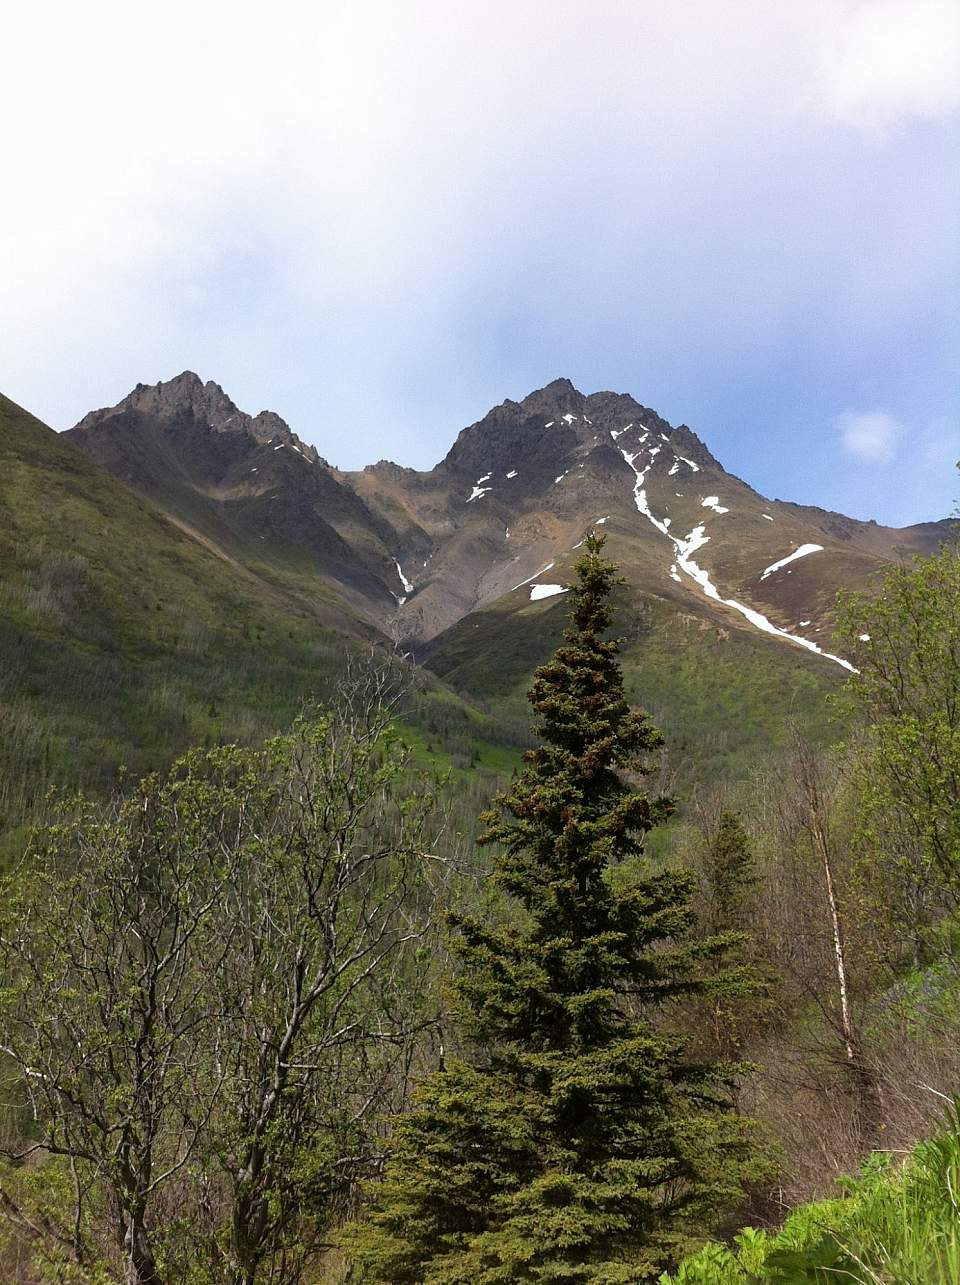 Twin-Peaks-Trail IMG_0431-ov8xcb